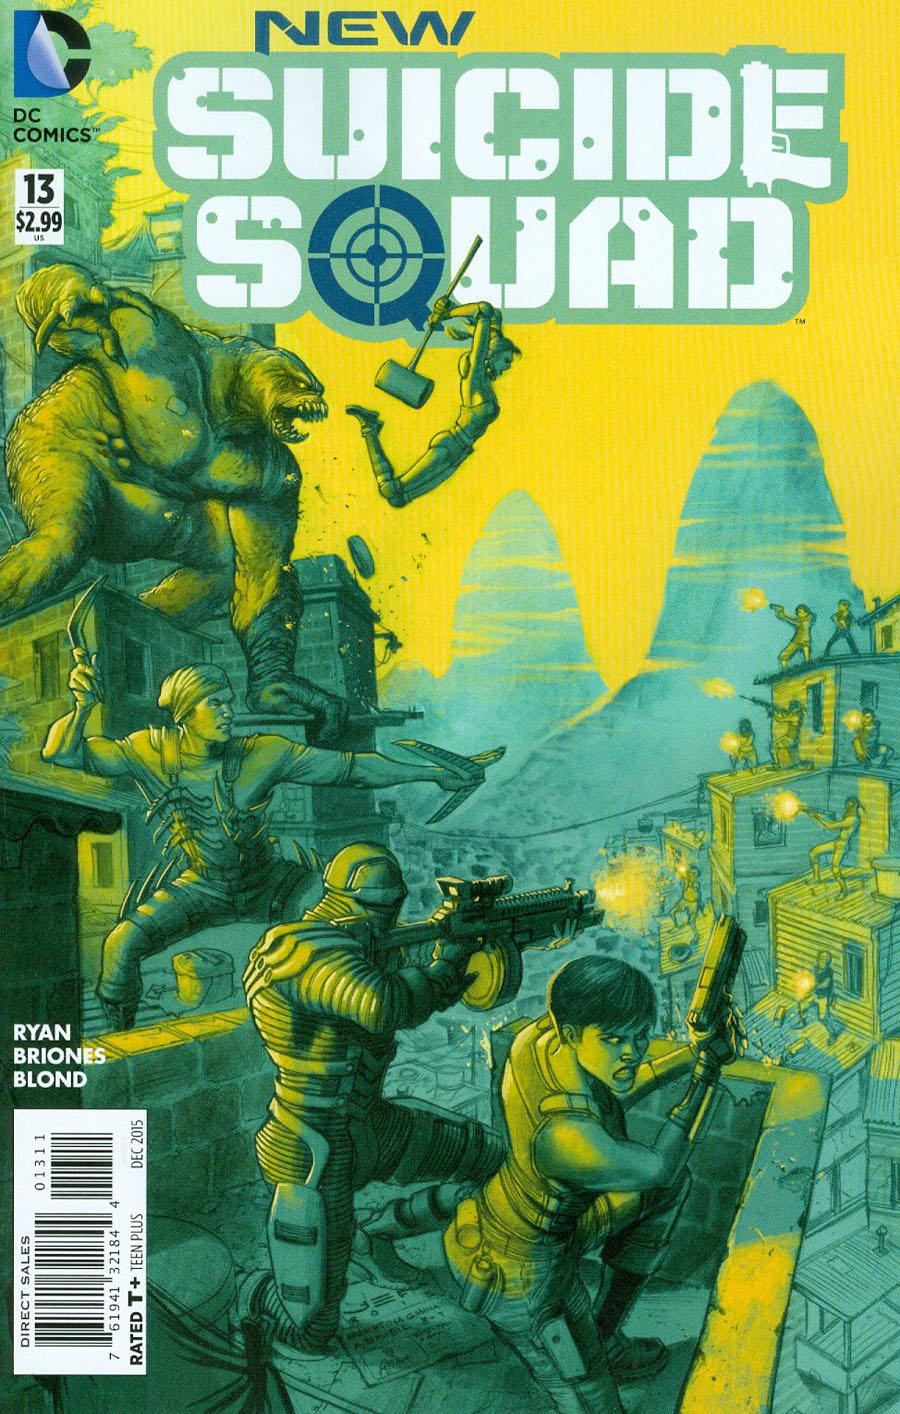 New Suicide Squad #13 Cover A Regular Juan Ferrerya Cover